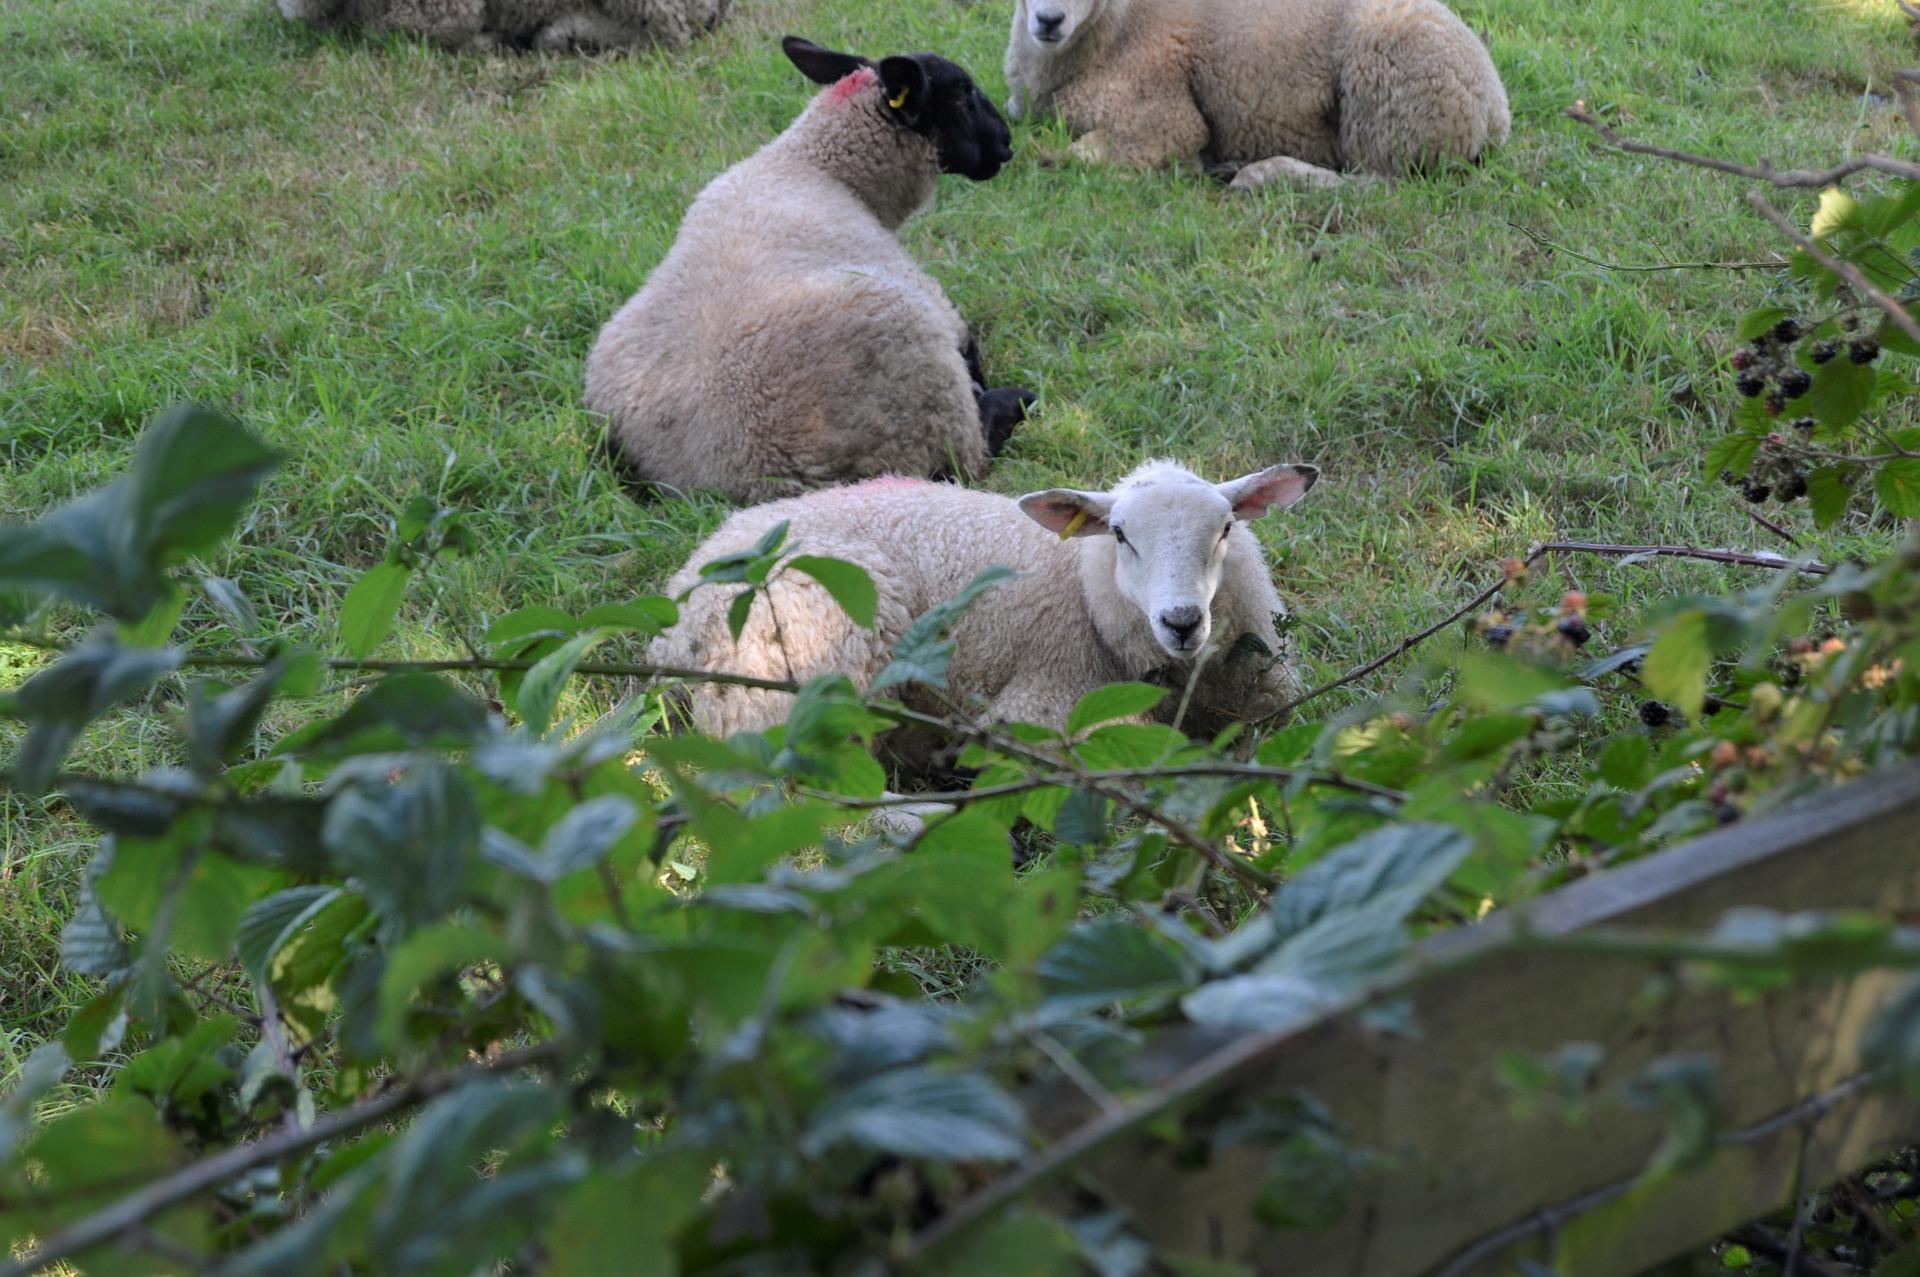 sheep-5503849_1920